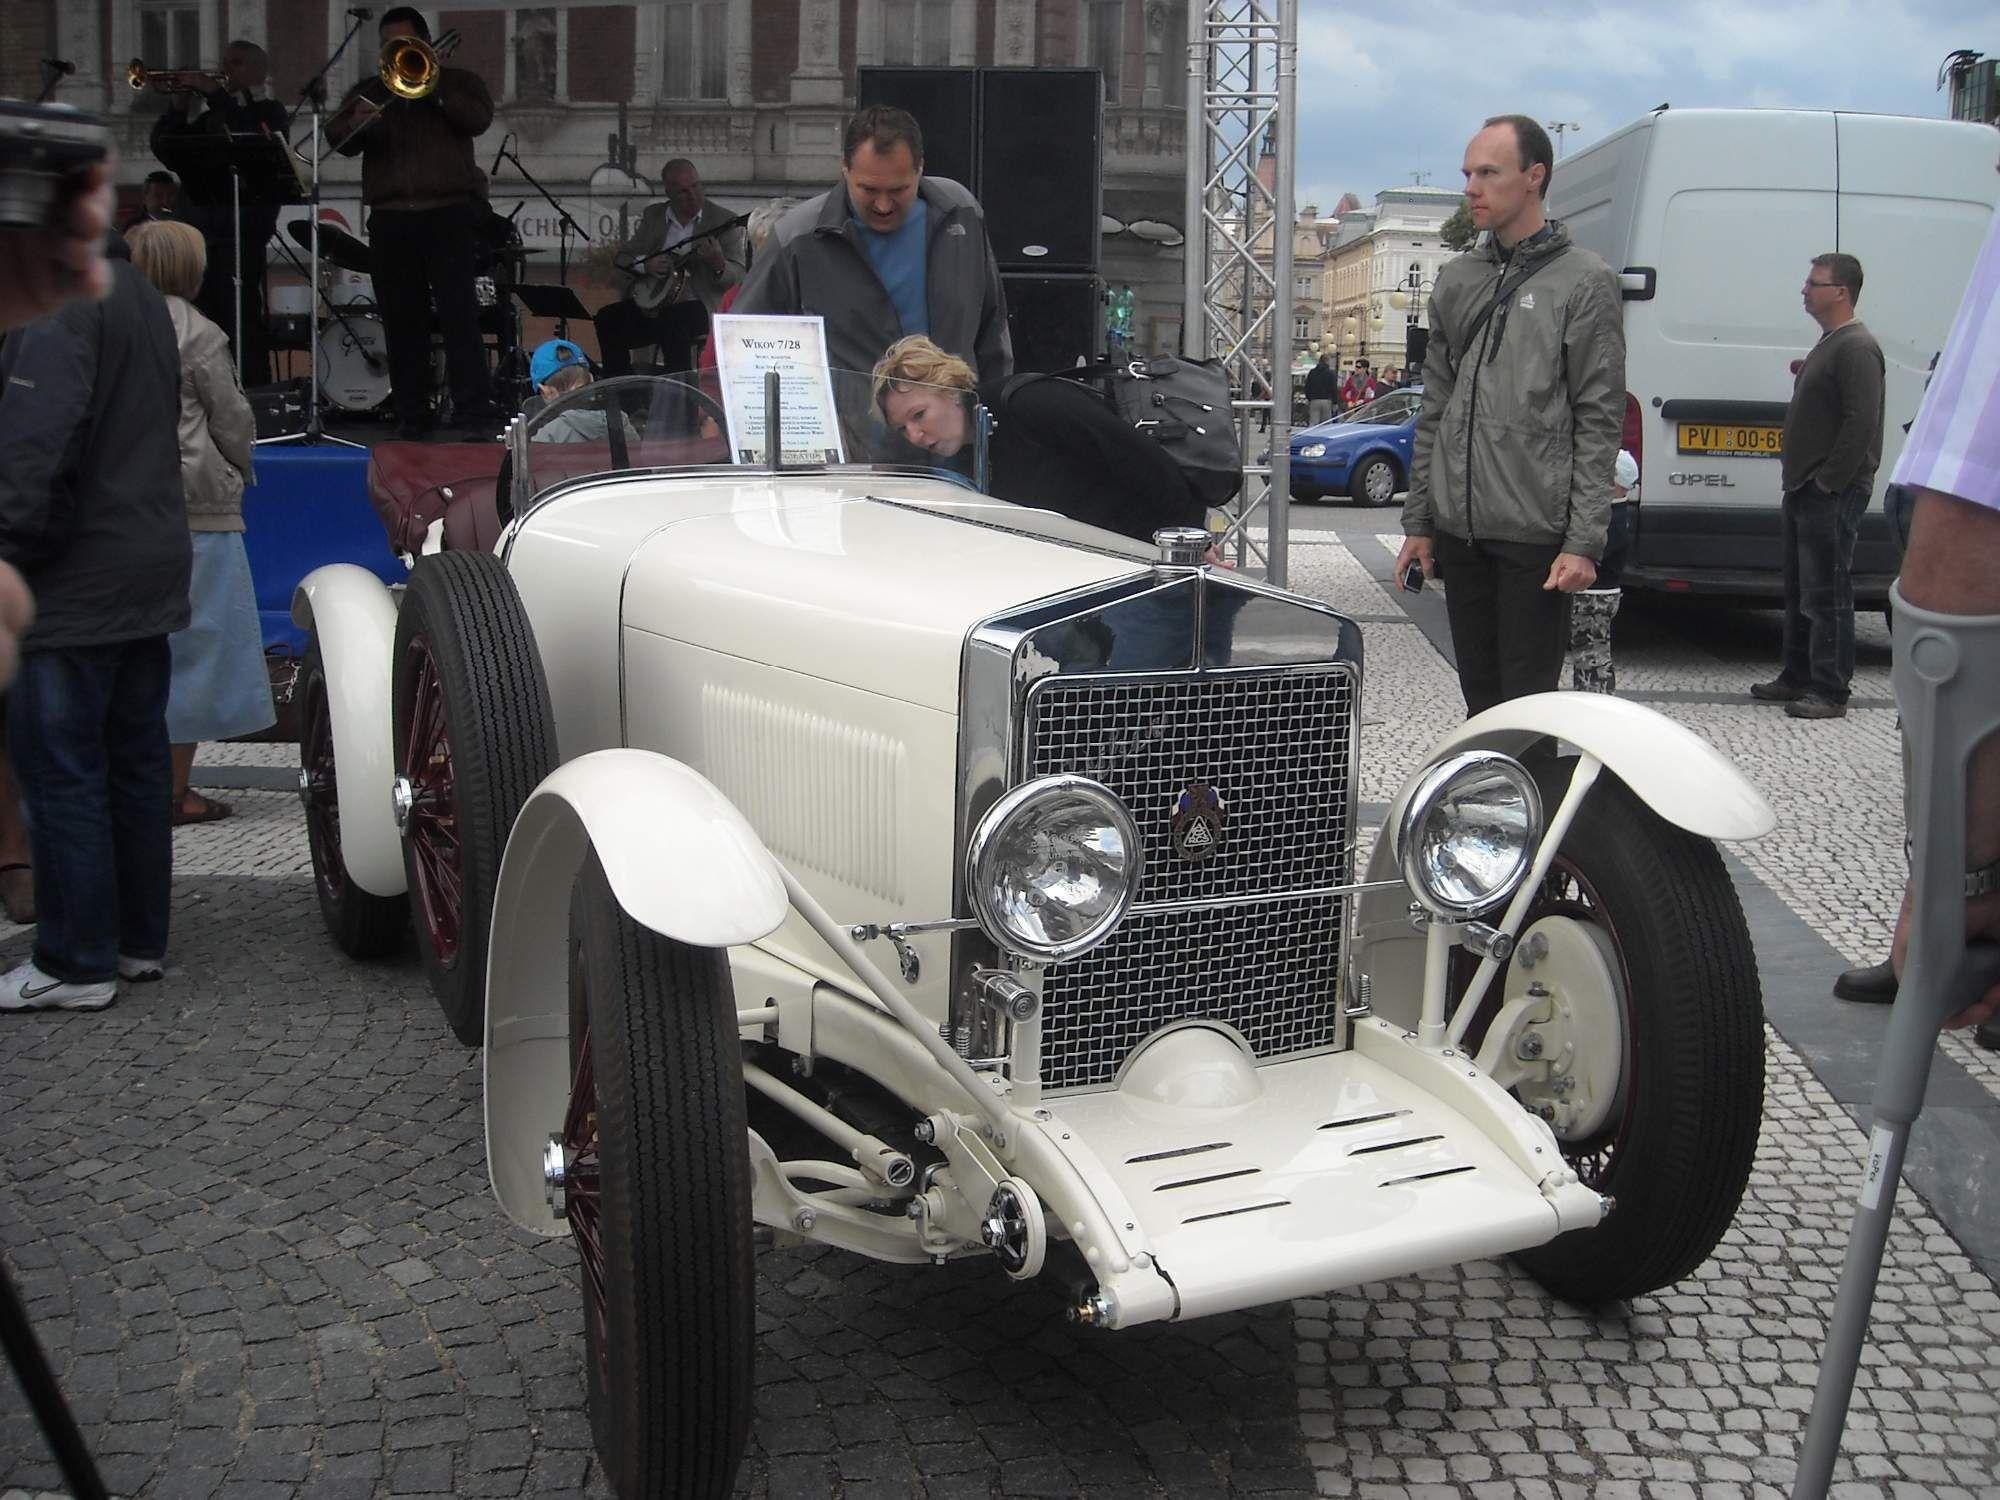 Pin By Jan Halaxa On Czechoslovak Classic Cars Pinterest Cars